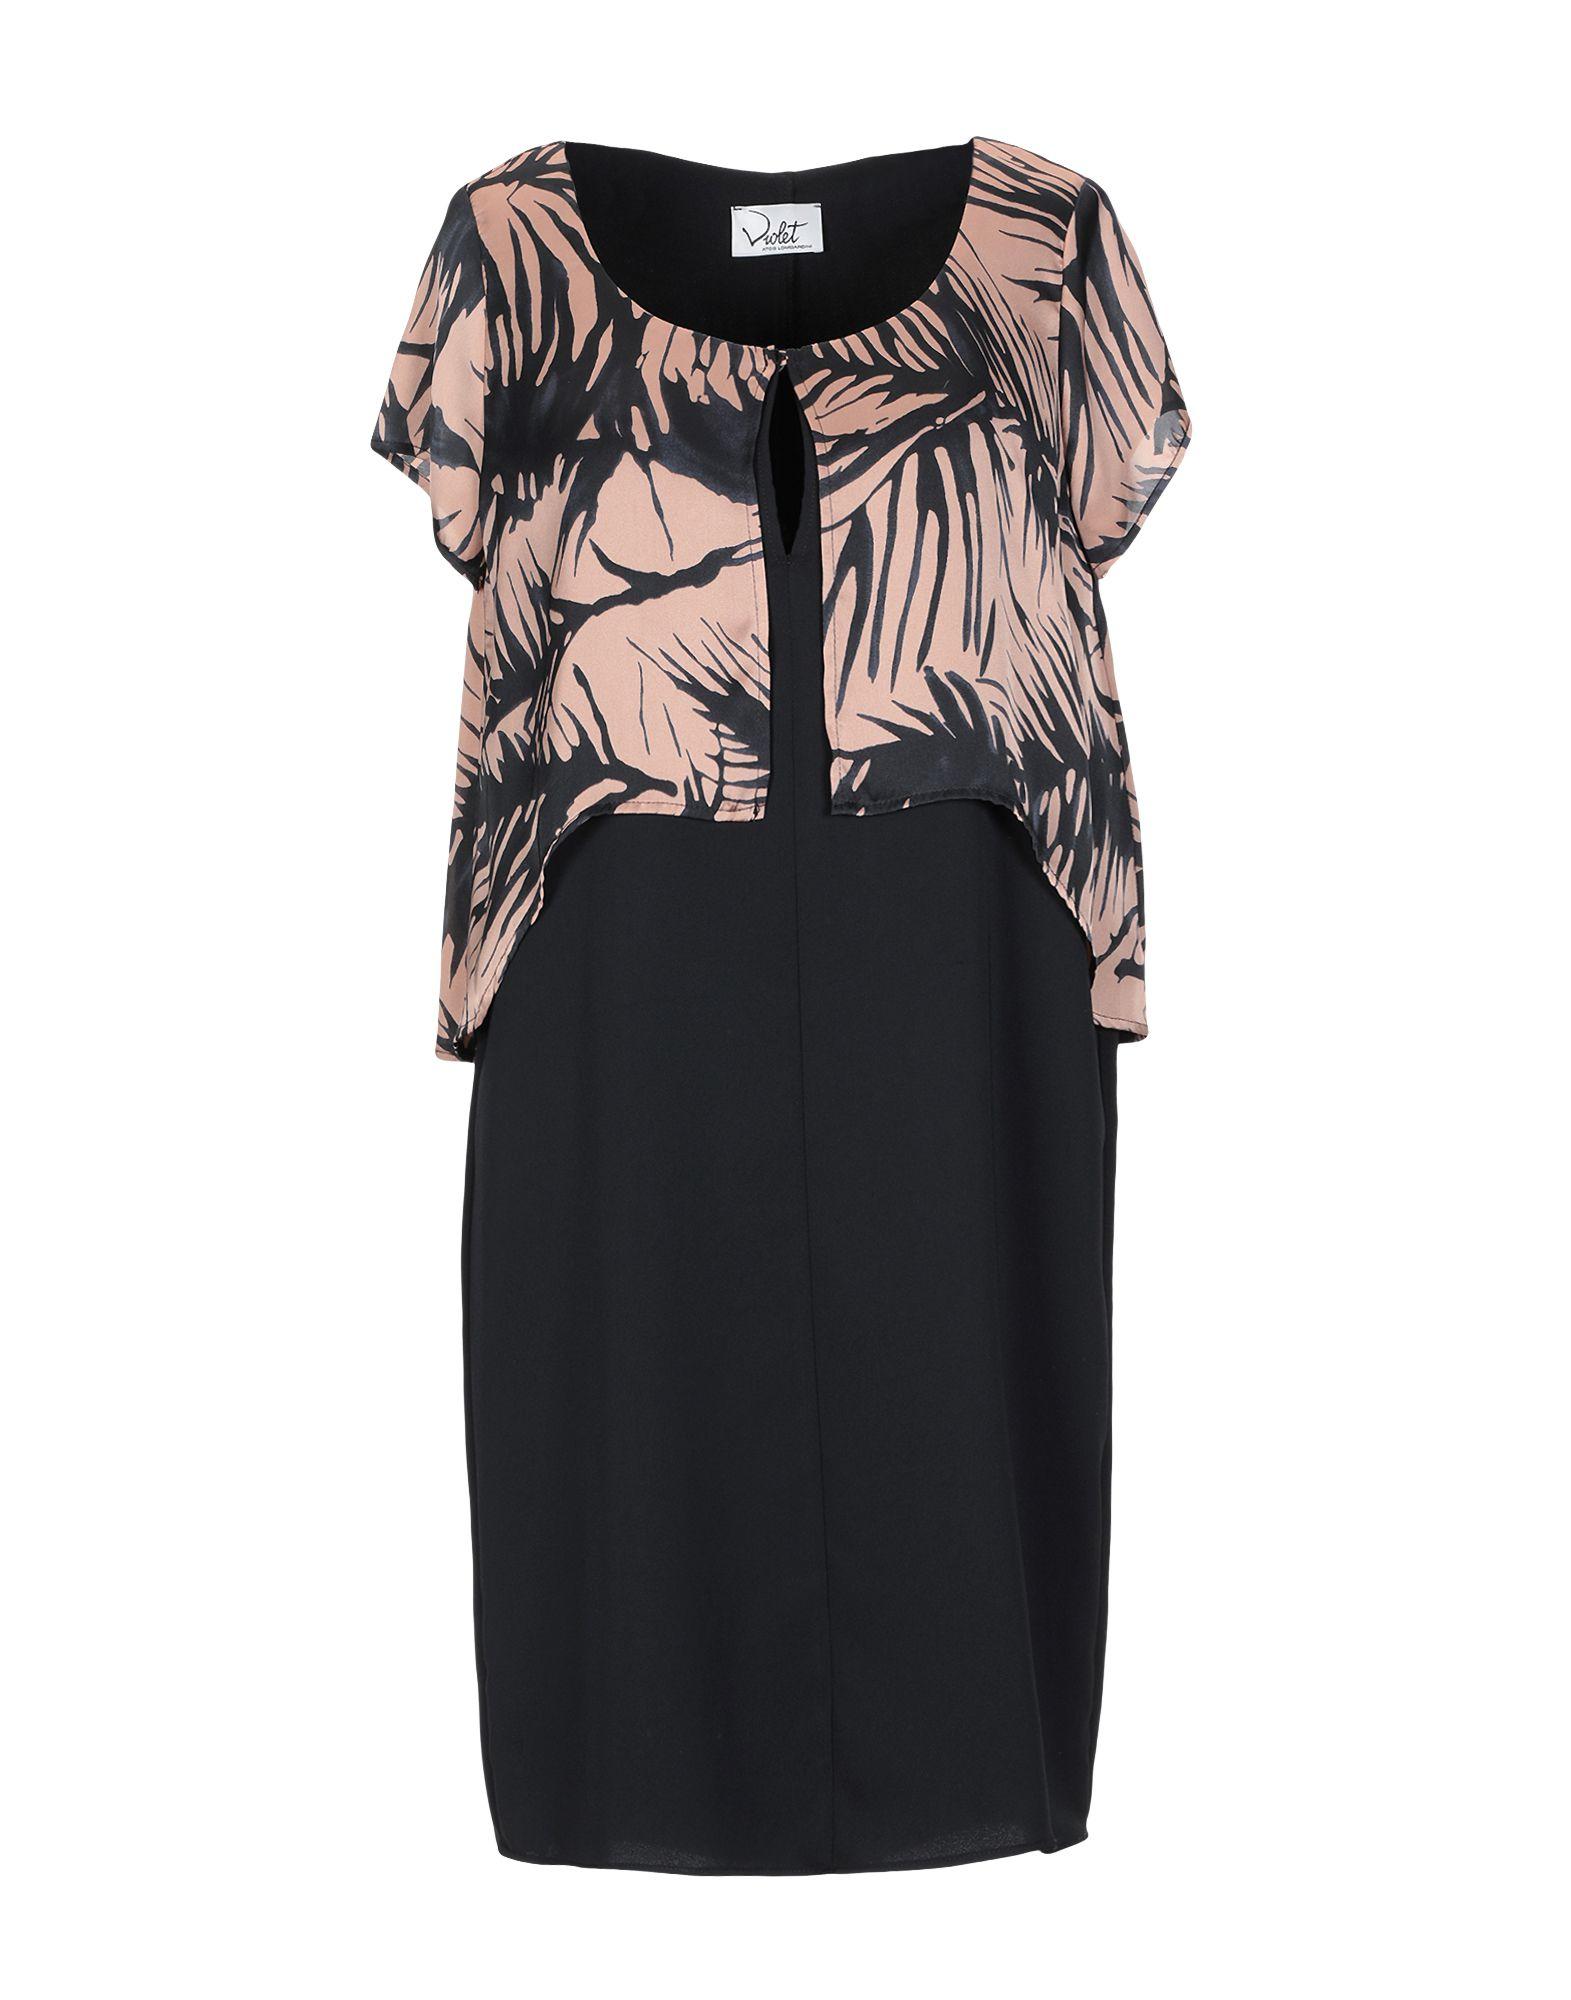 VIOLET ATOS LOMBARDINI Короткое платье violet atos lombardini длинное платье